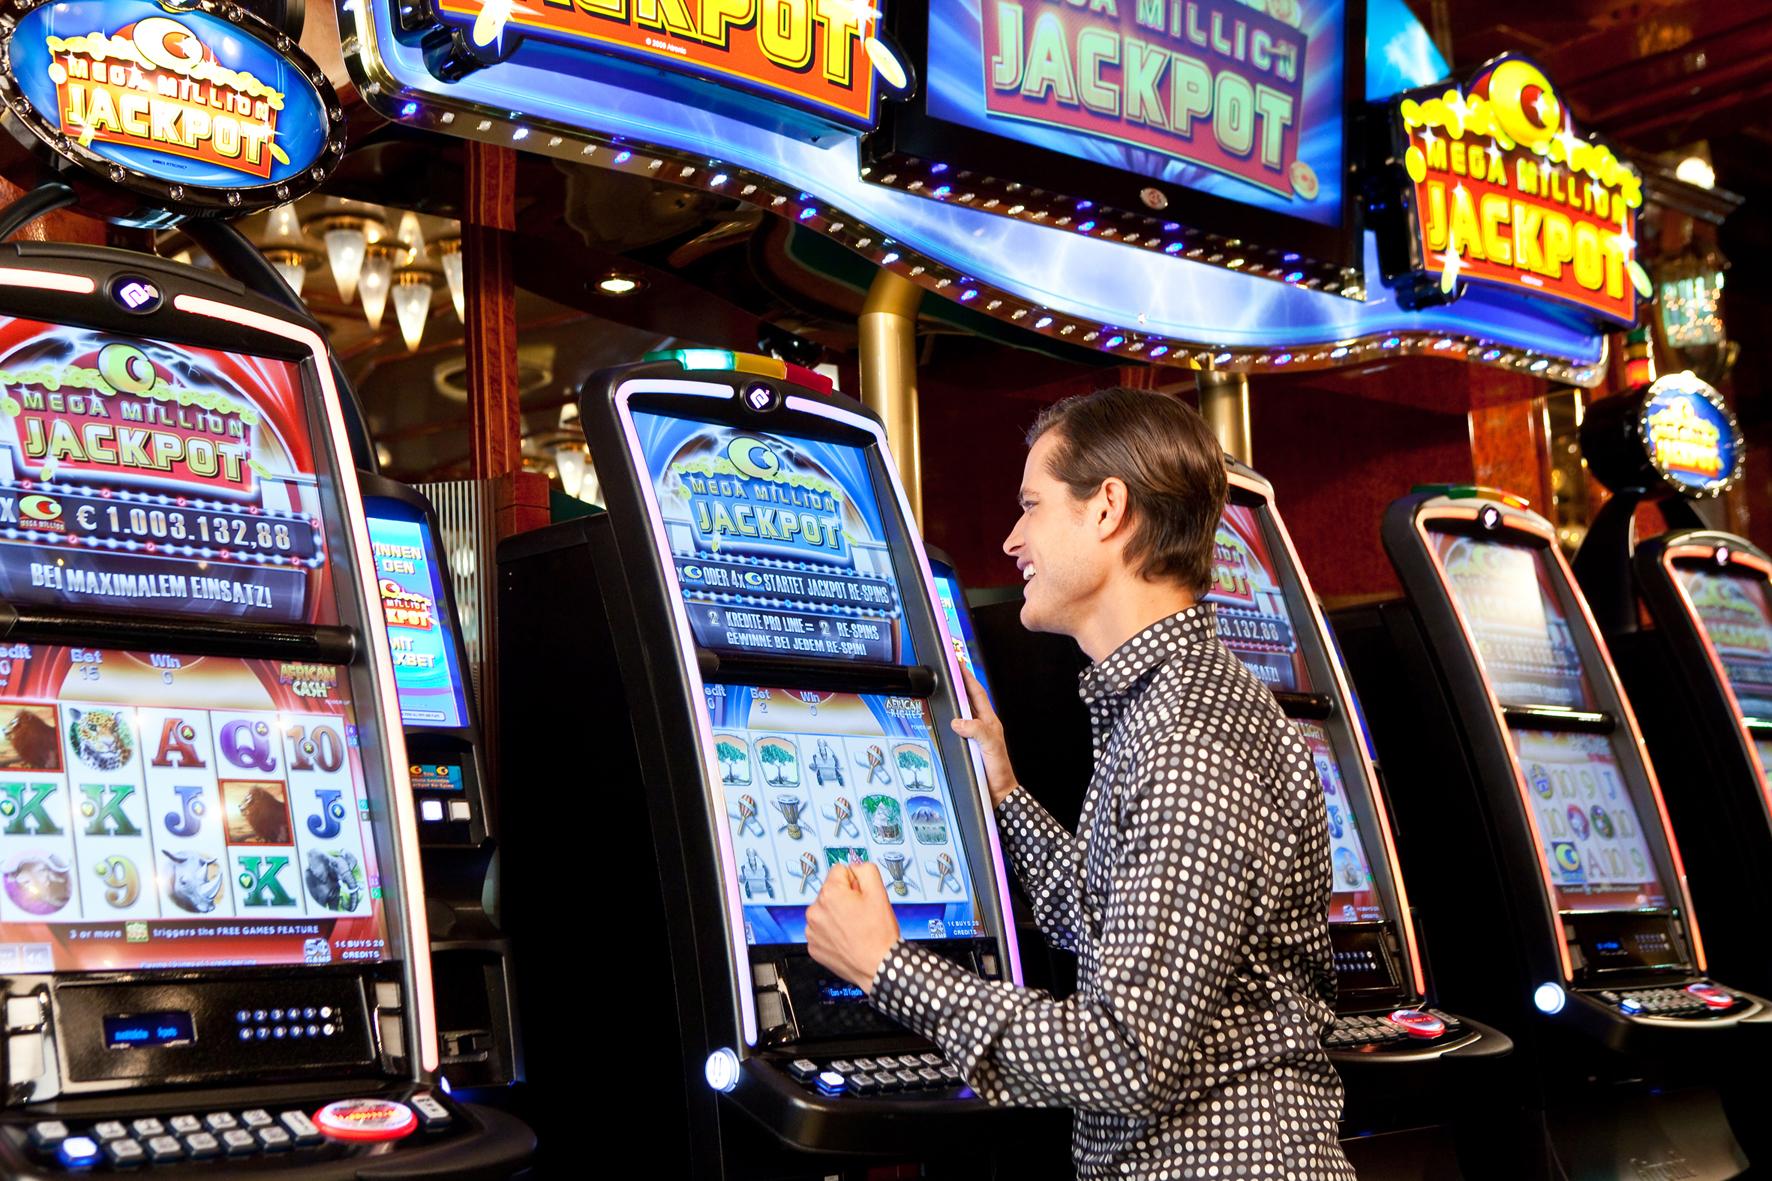 Casino Austria Jackpot